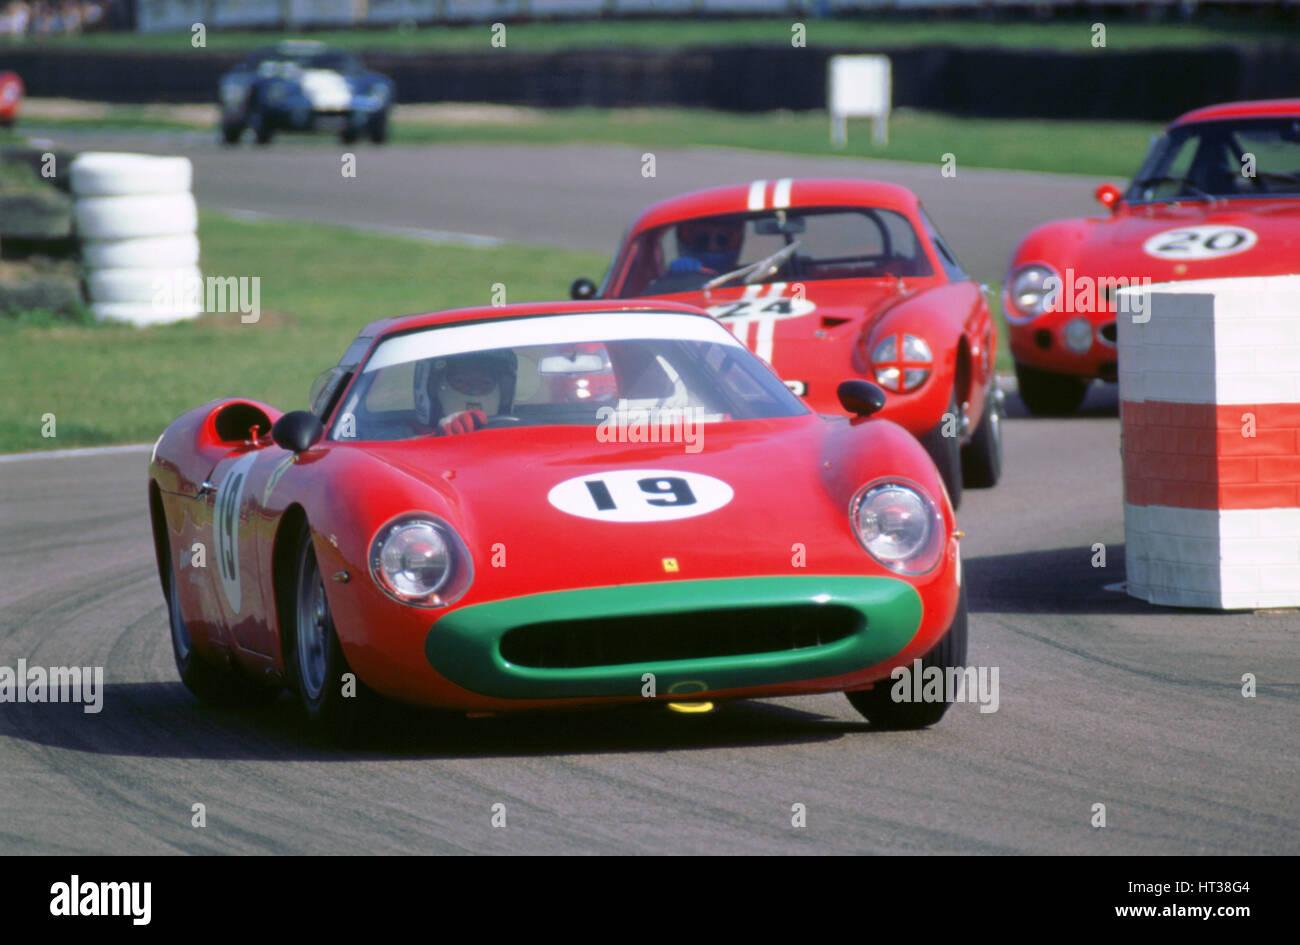 1998 Goodwood Revival Meeting, 1964 Ferrari 275LM. Künstler: unbekannt. Stockbild